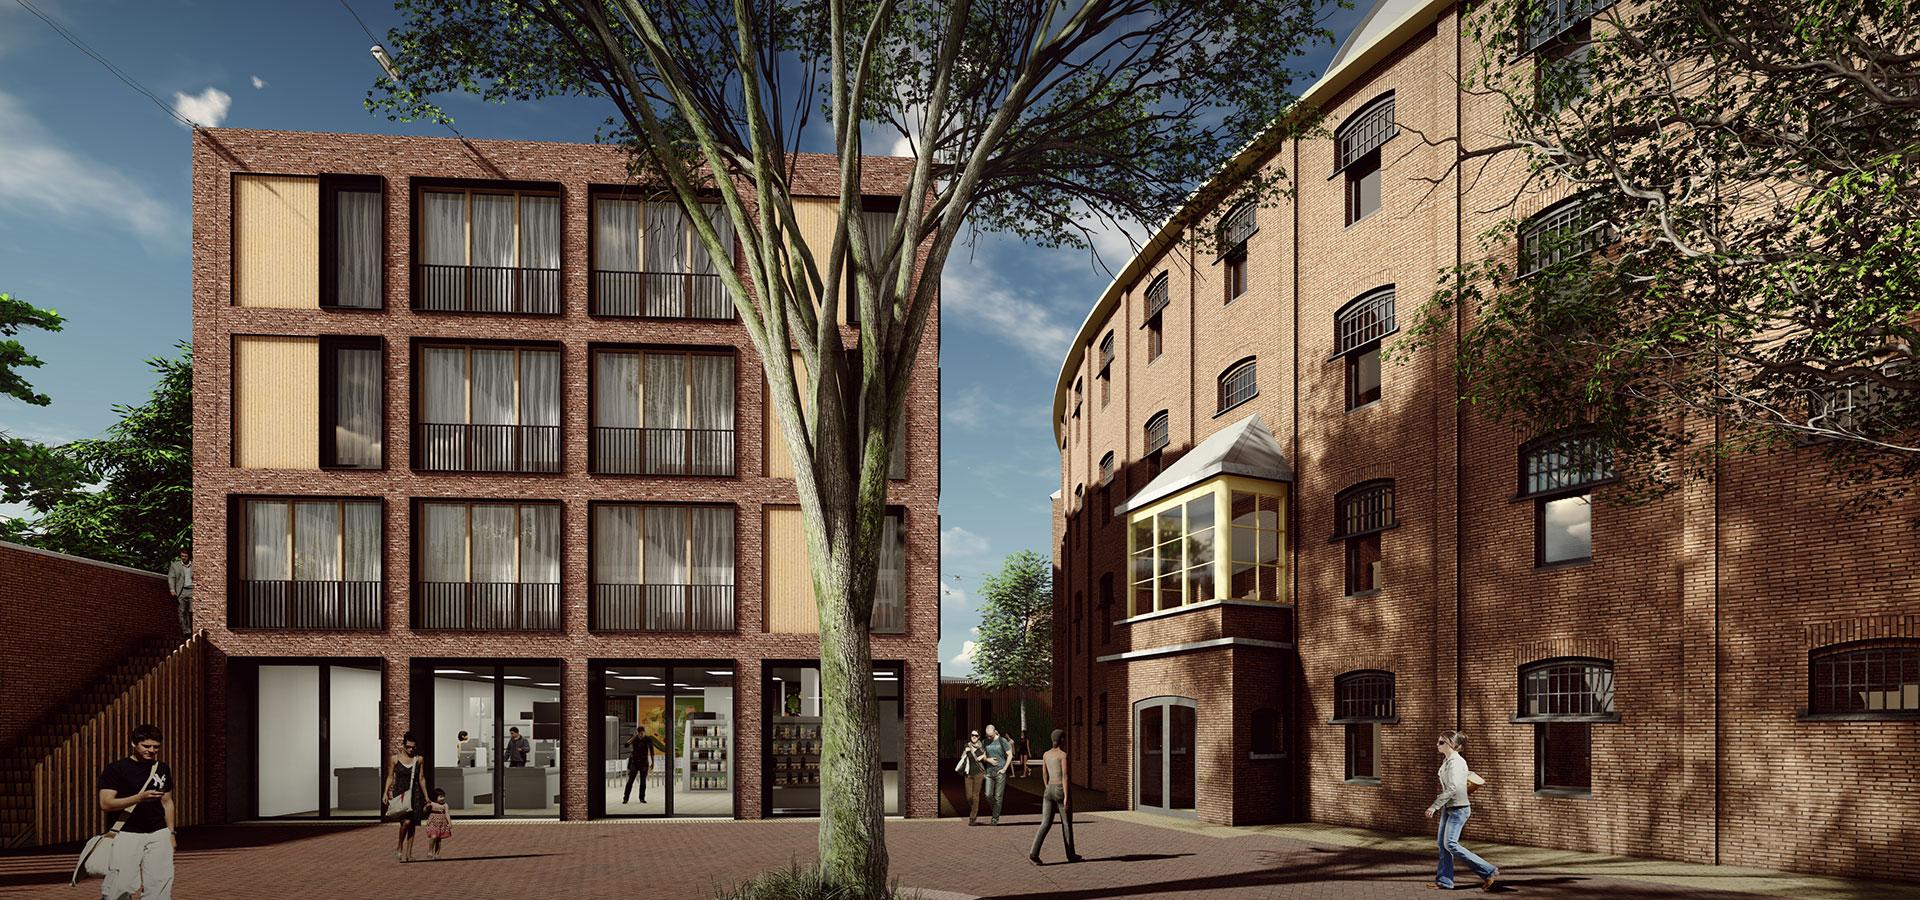 FARO architecten Koepel Haarlem 04